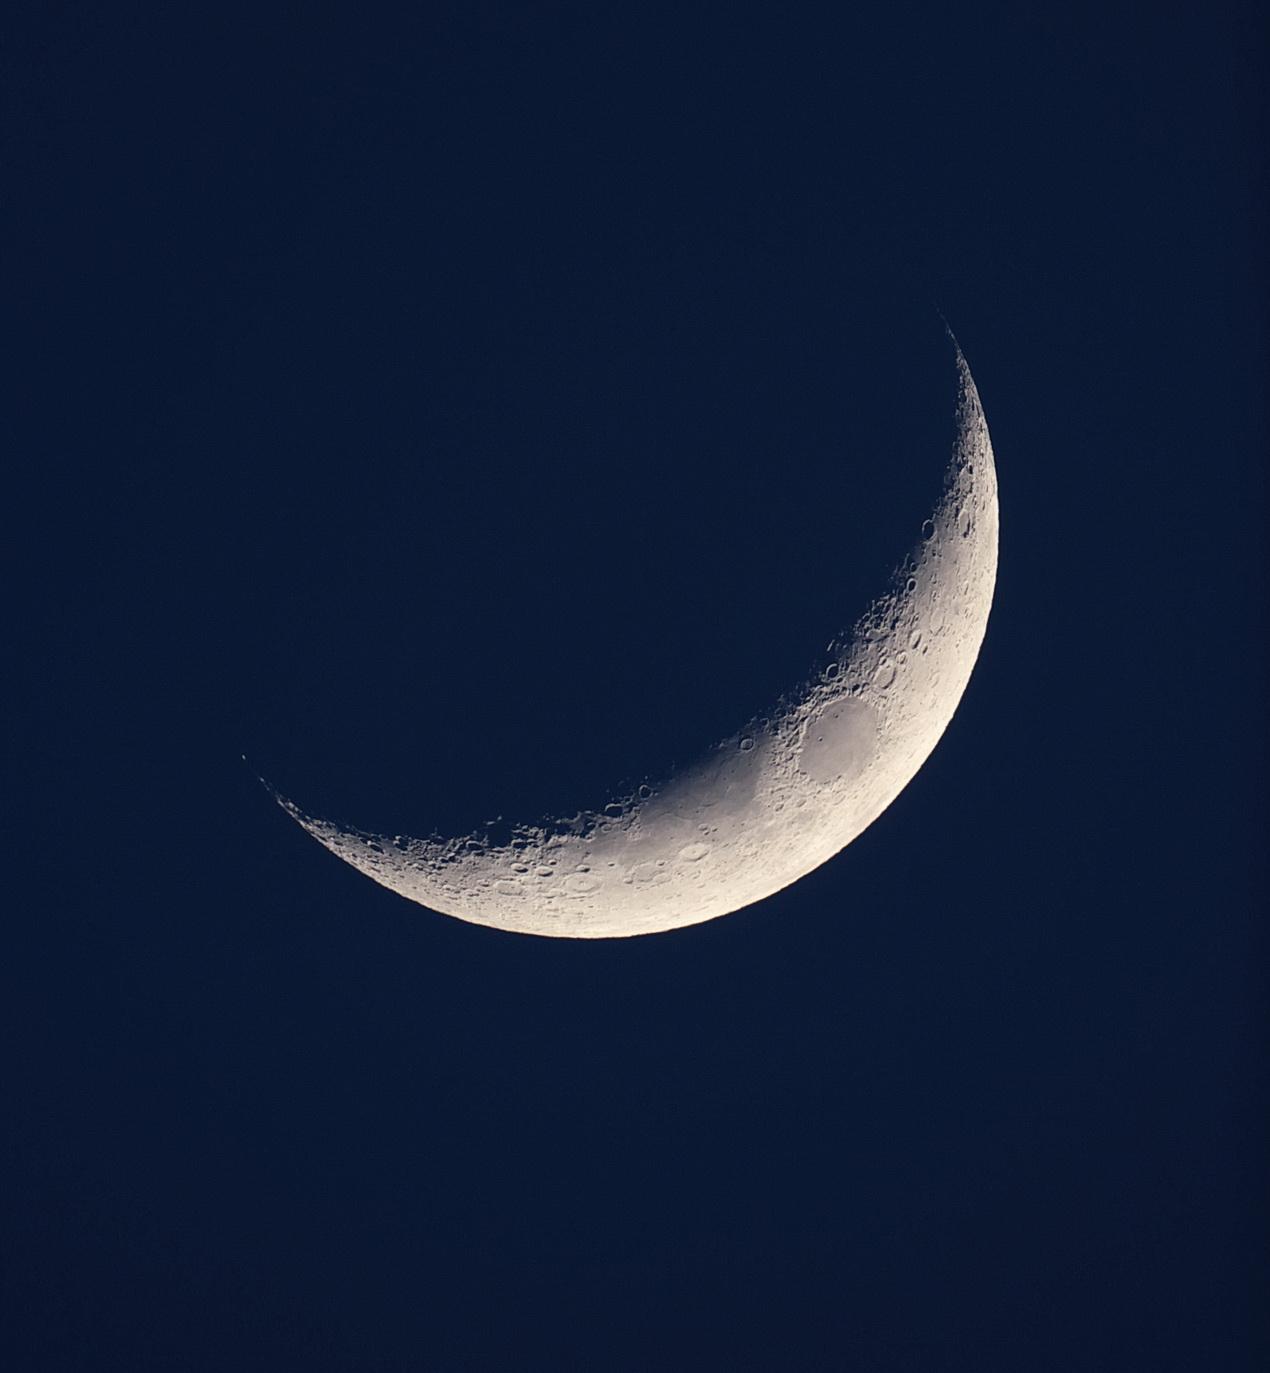 moon_22_02-15_1r